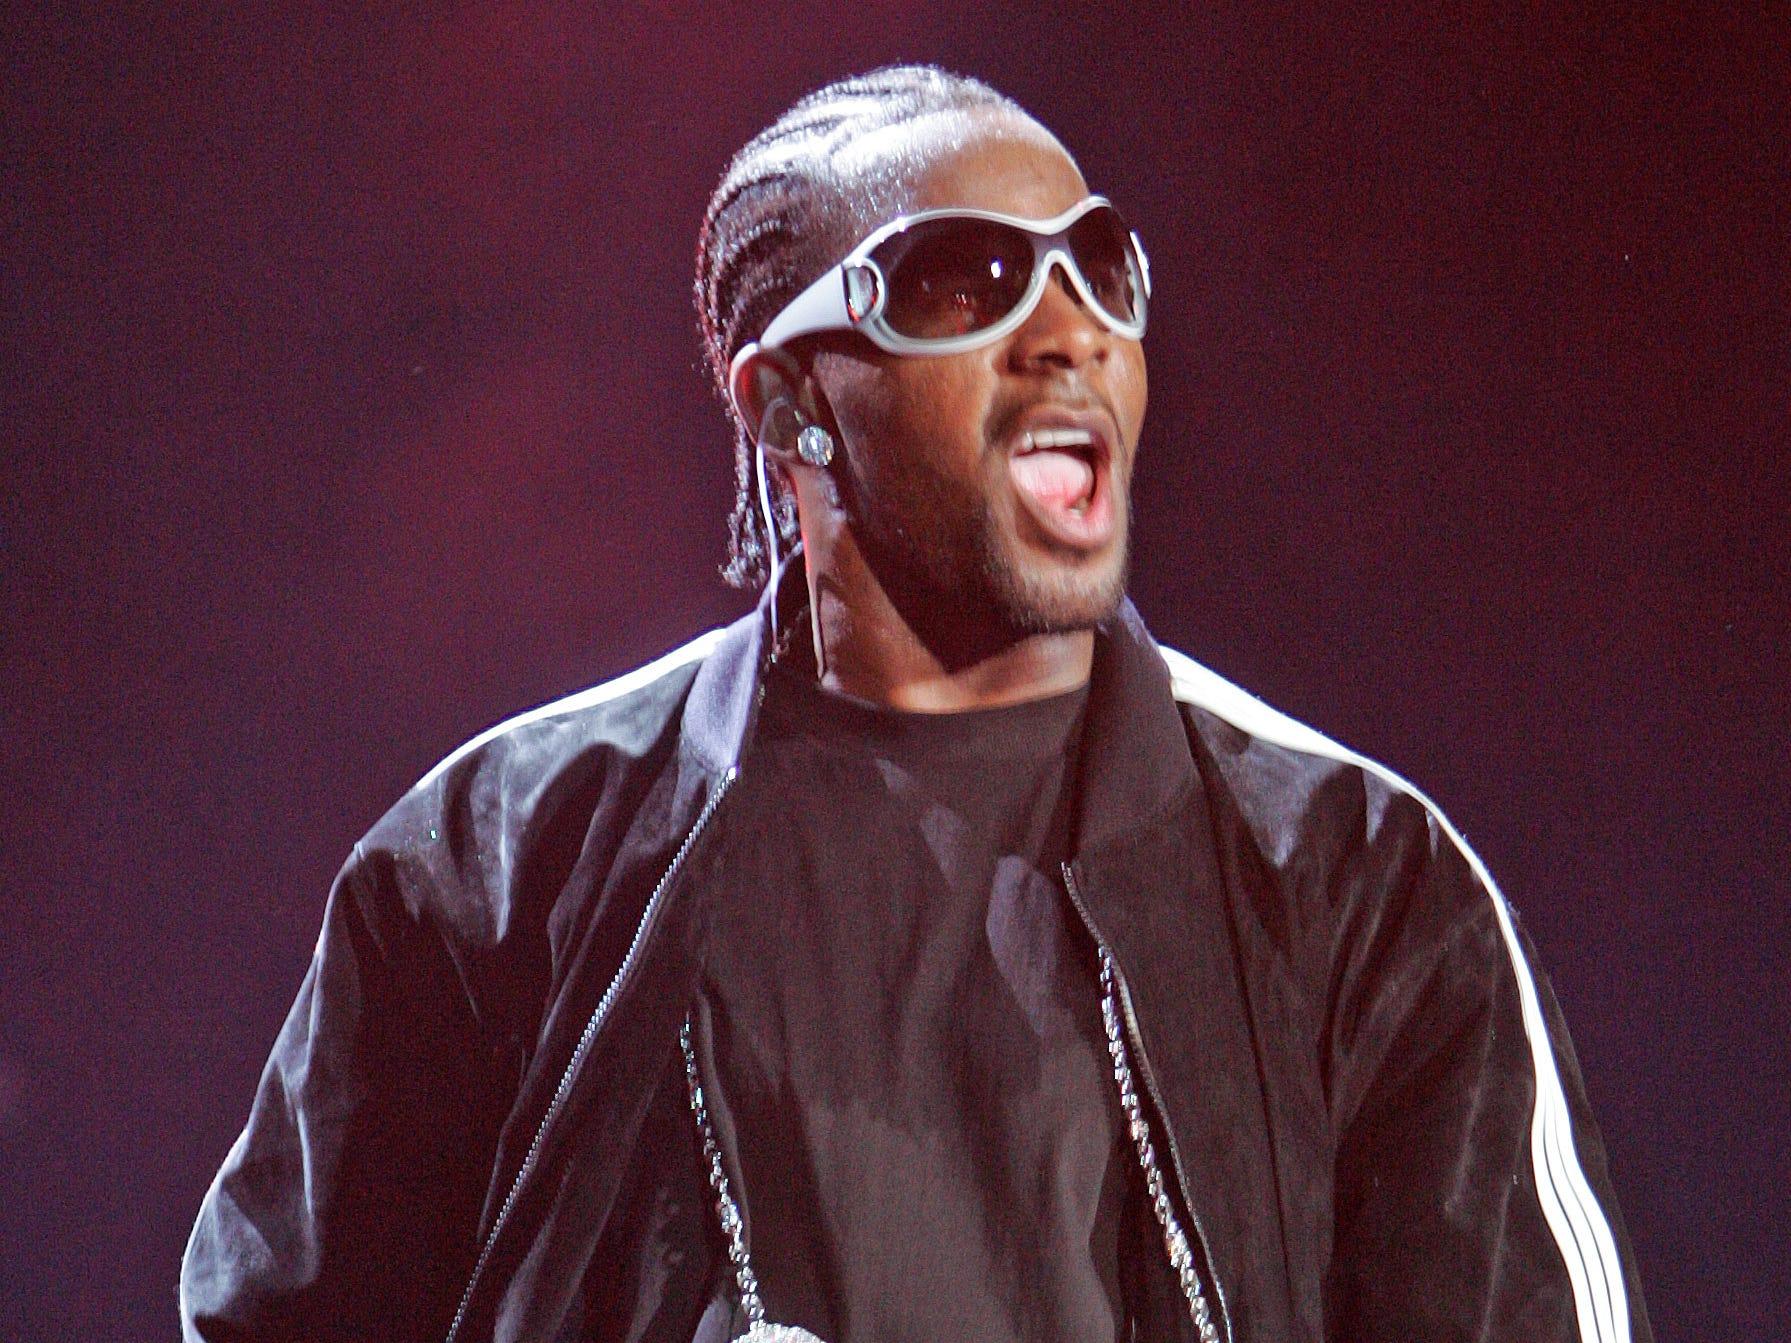 R. Kelly performs at Philips Arena in Atlanta on Nov. 15, 2007.